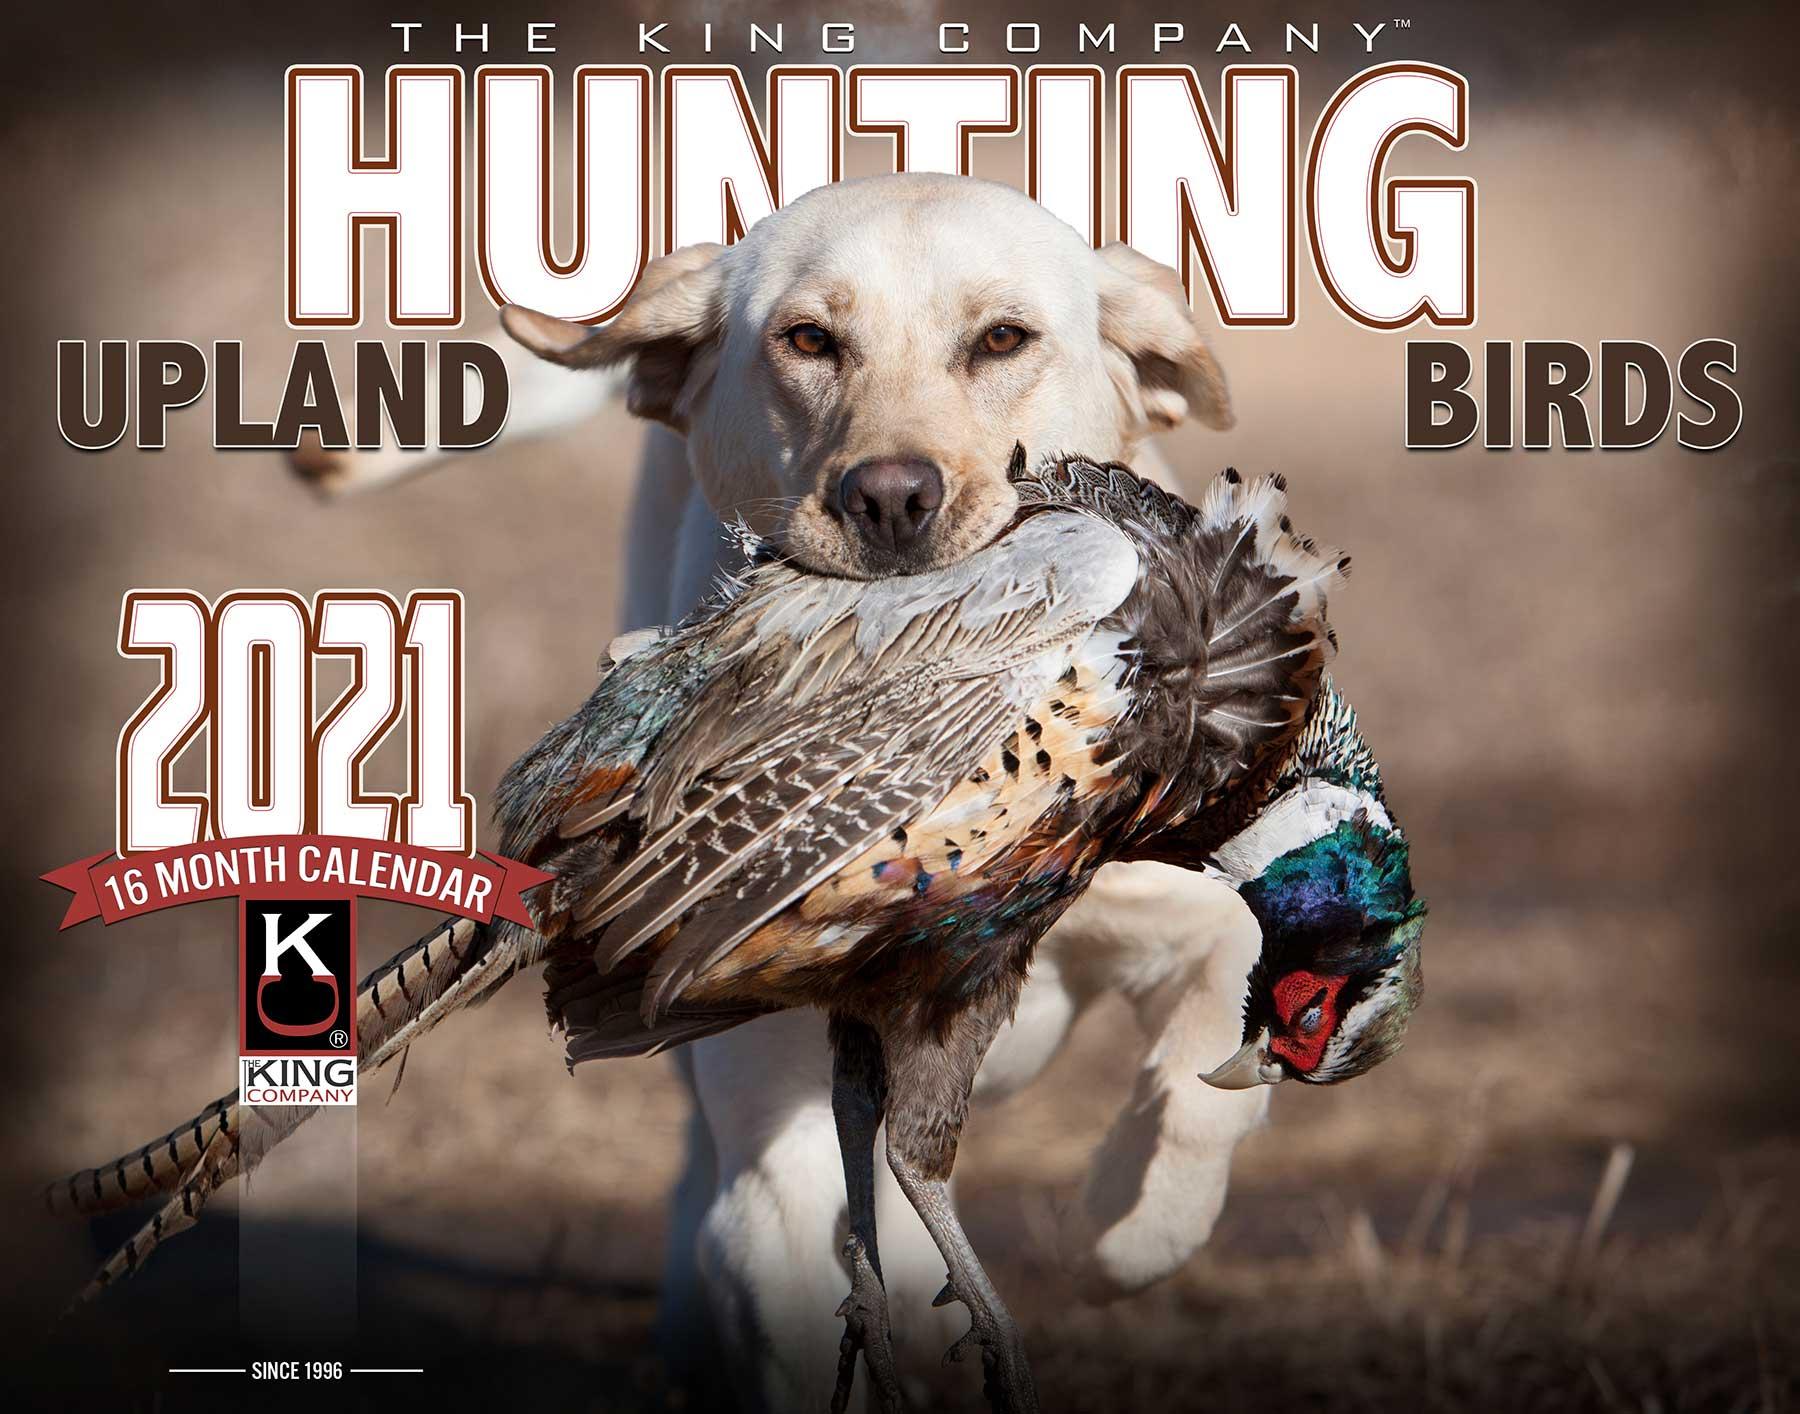 2021 Upland Hunting Calendar in Hunting Calendar 2021